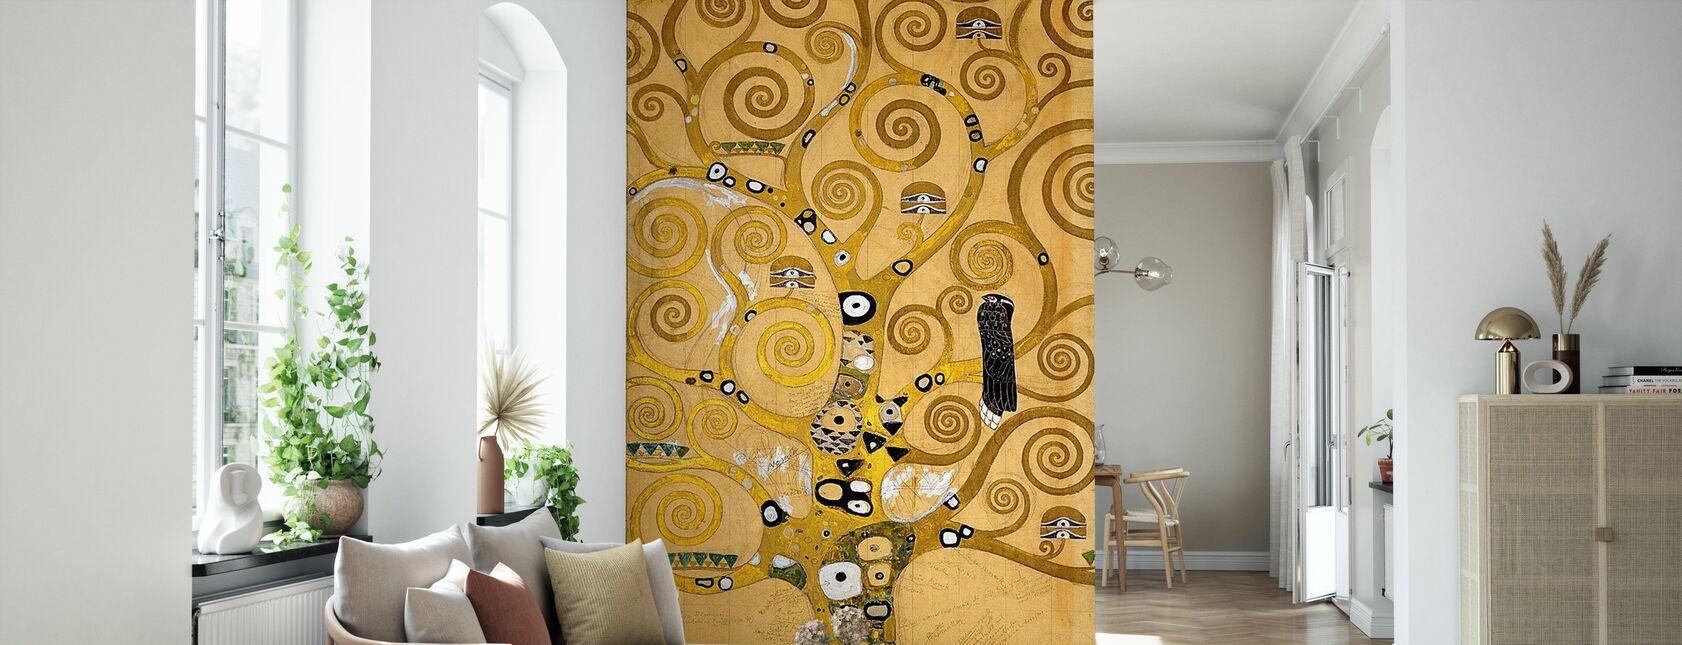 Klimt, Gustav - The Tree of Life - Wallpaper - Living Room